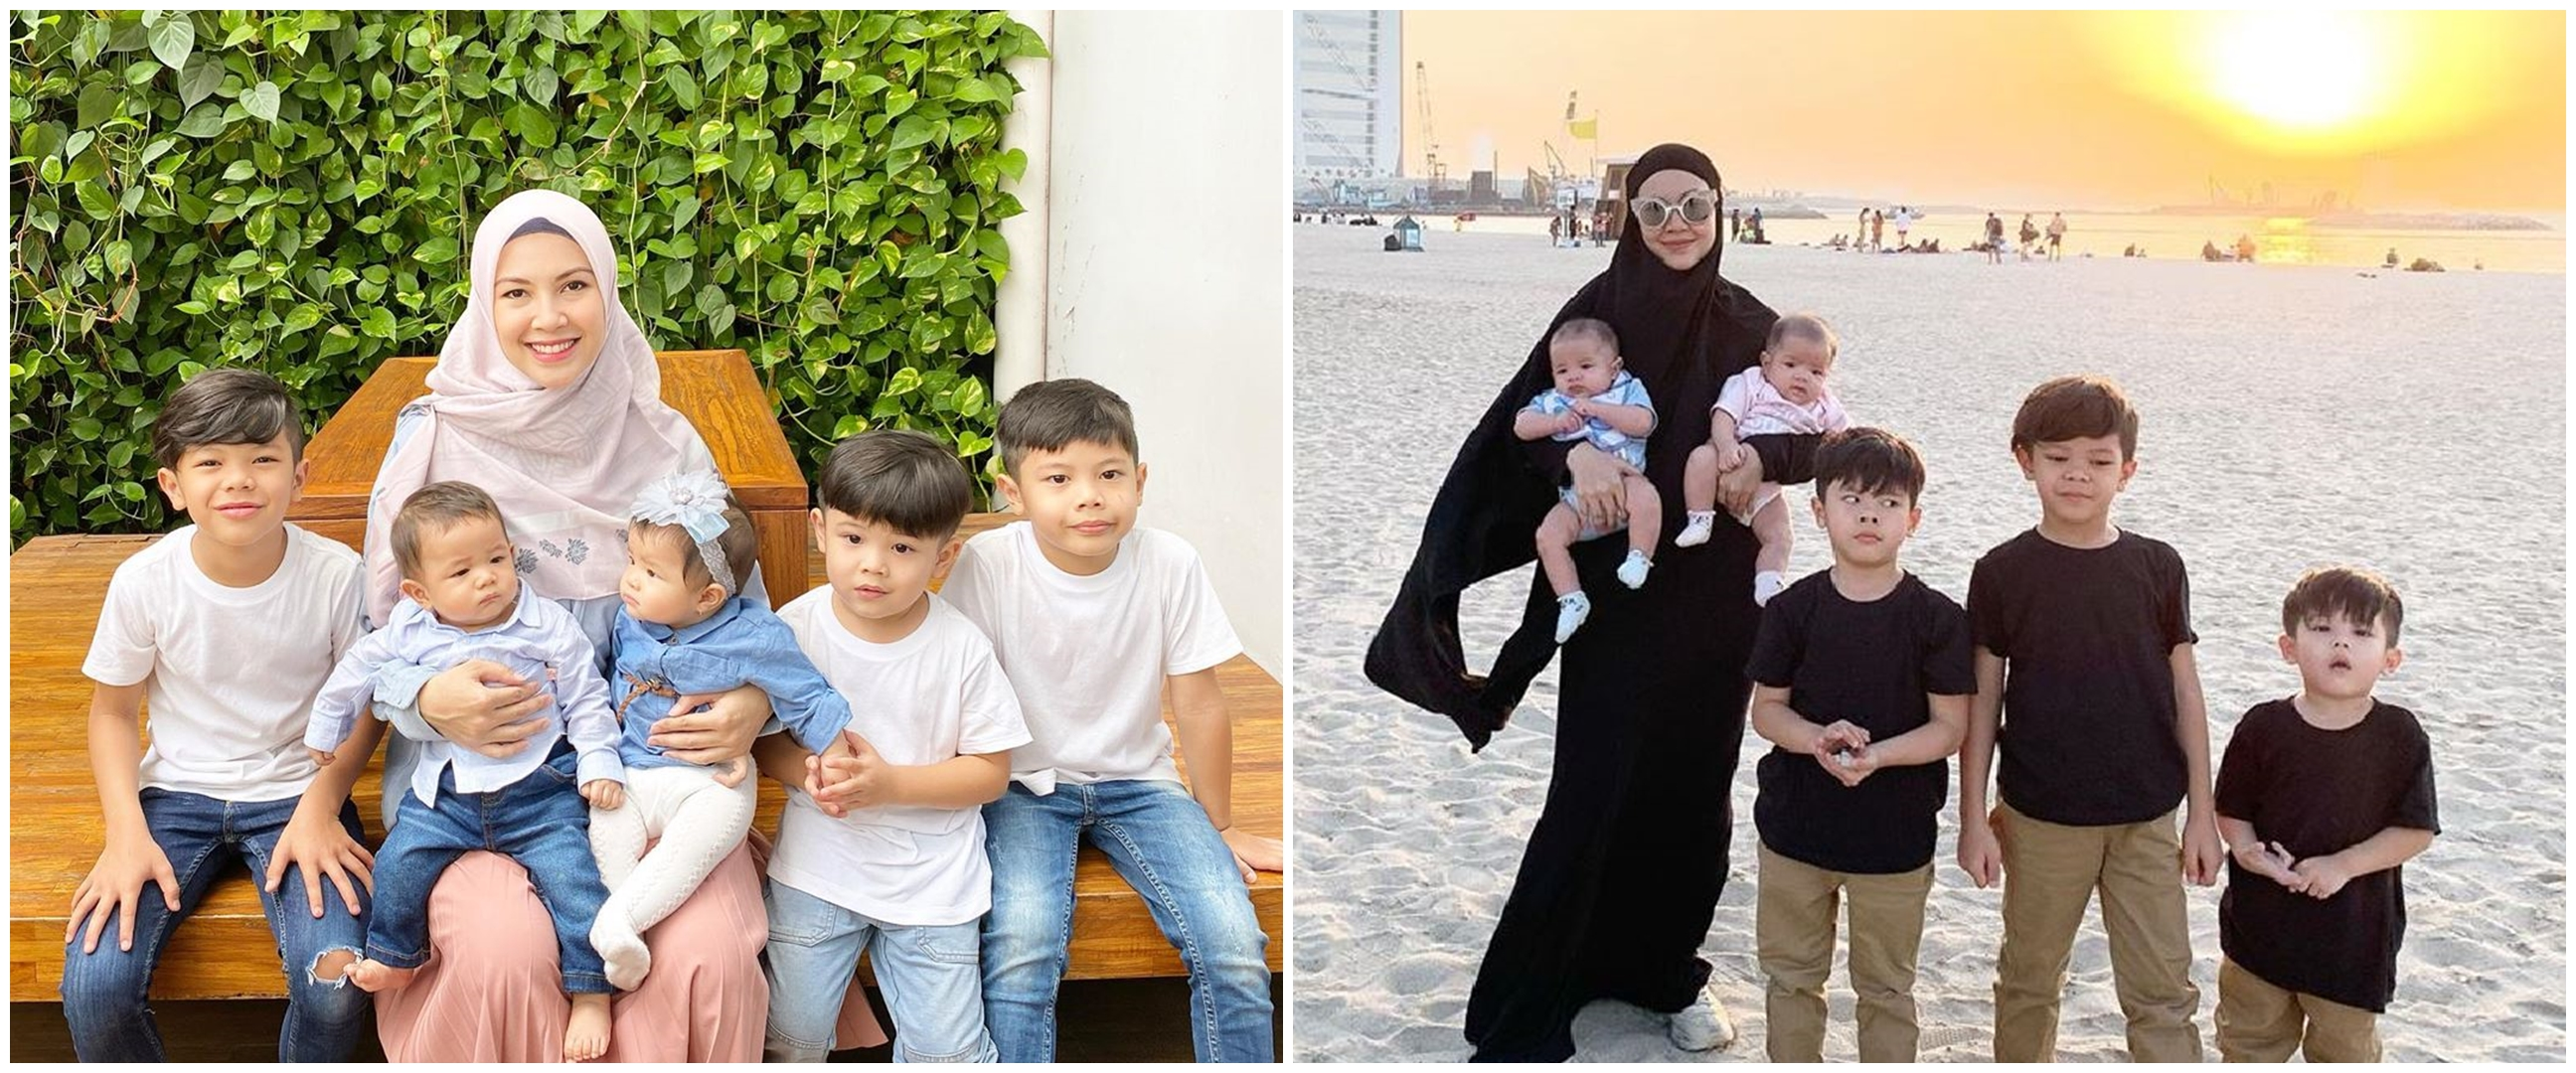 8 Potret kompak Ratna Galih dan kelima anaknya, gemes!